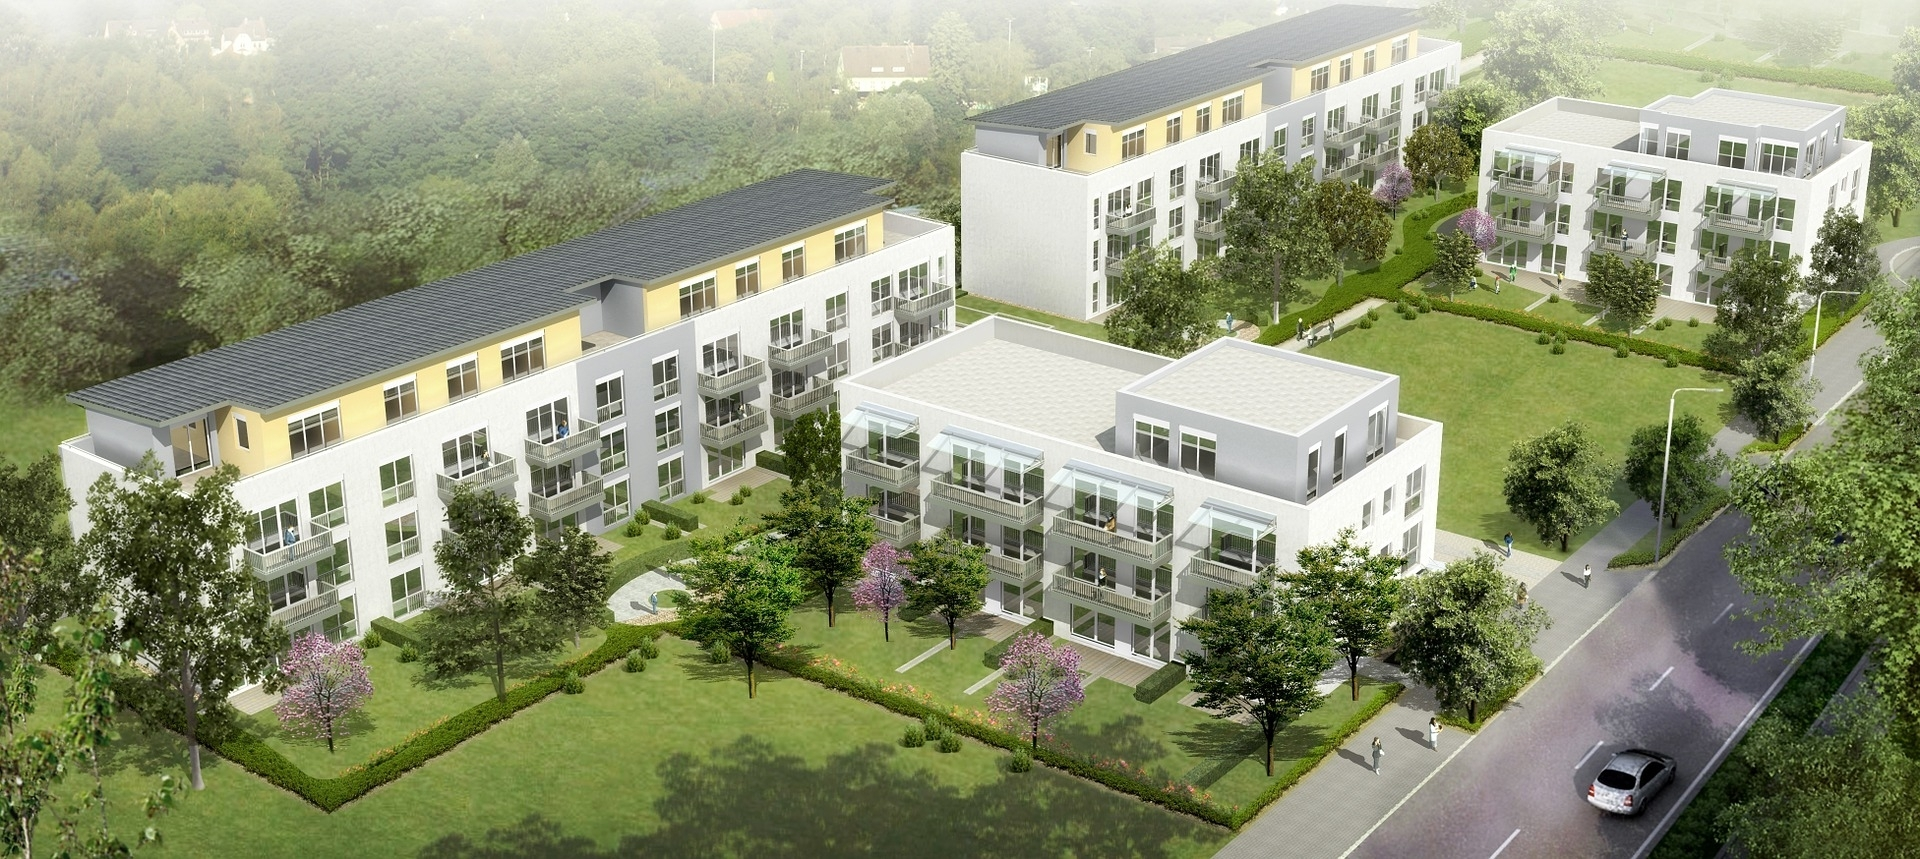 Immobilien und Investments